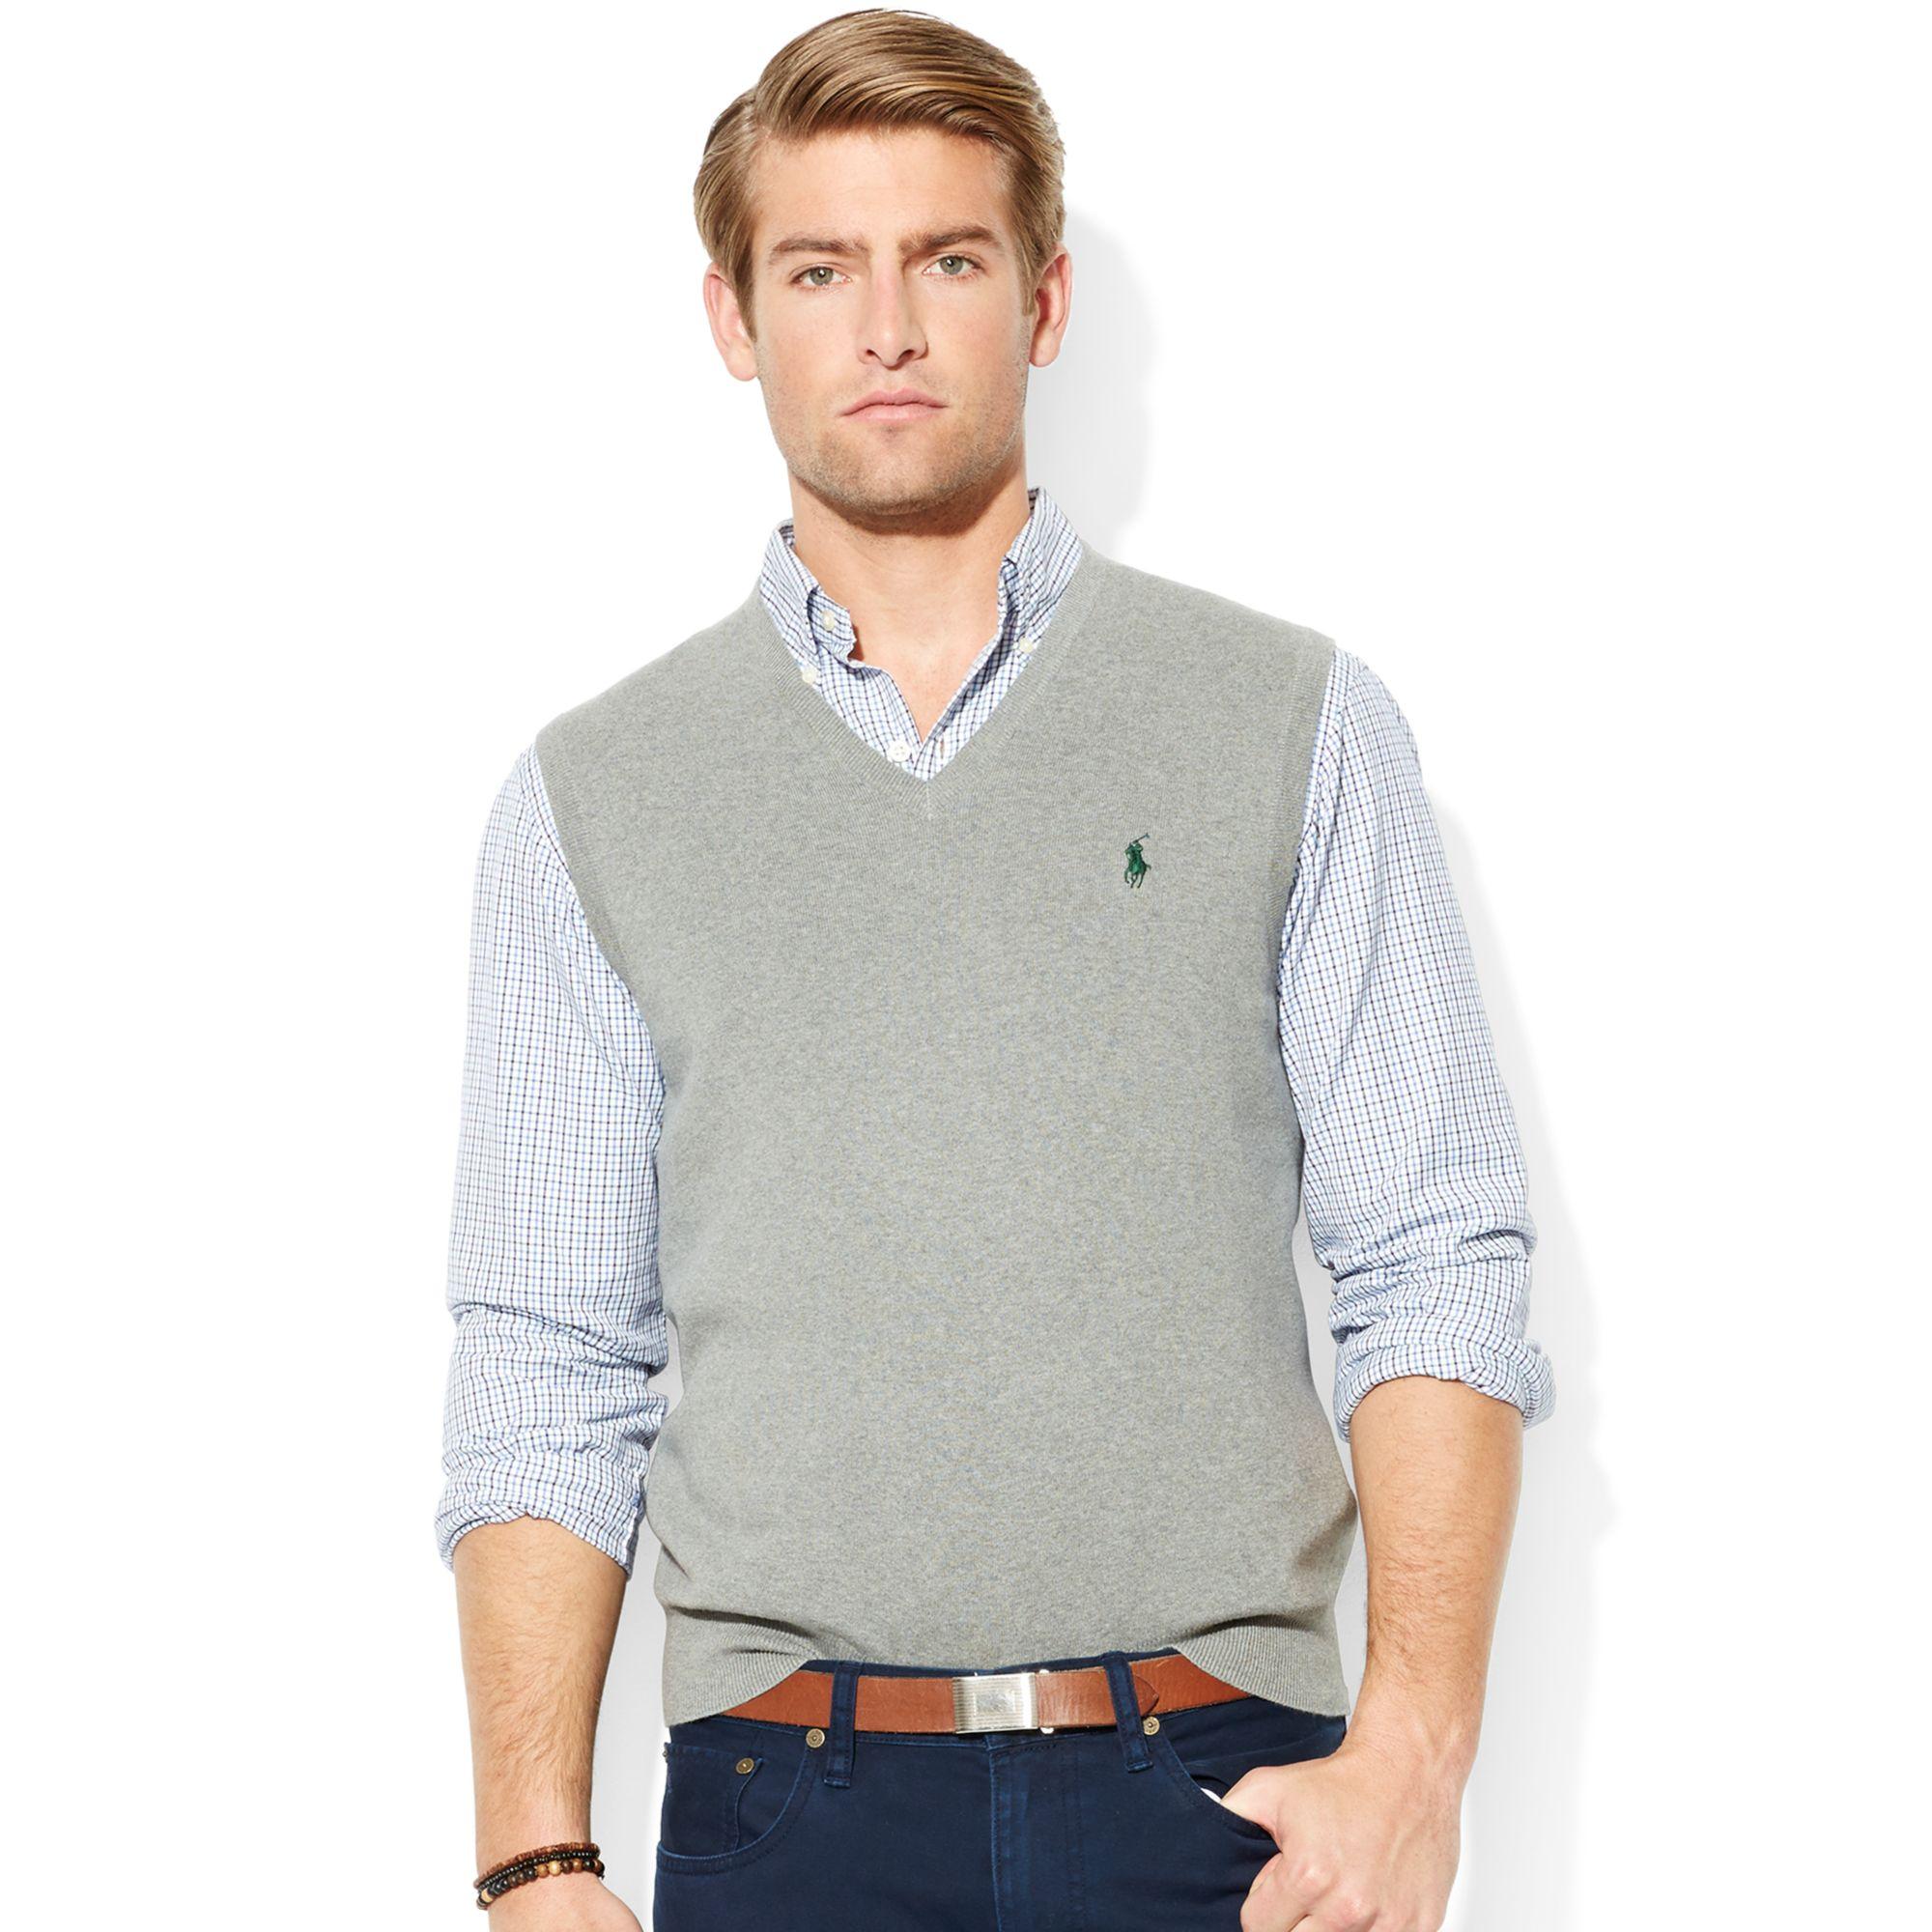 Polo Ralph Lauren Pima Cotton Vneck Sweater Vest In Gray